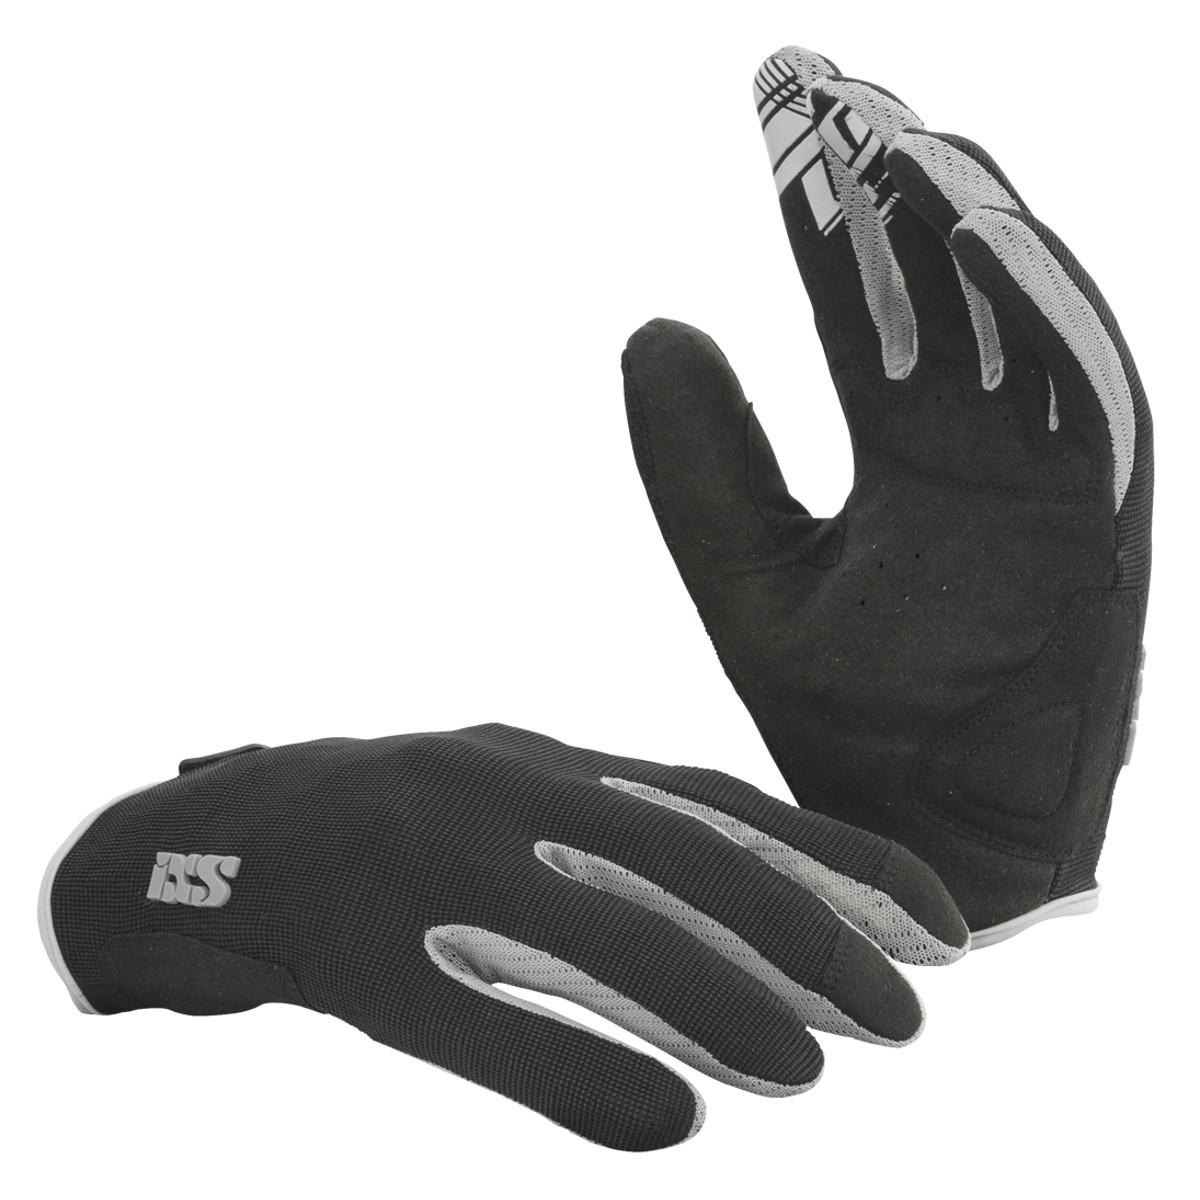 IXS Downhill-Handschuhe TR-X1.1, S, Schwarz